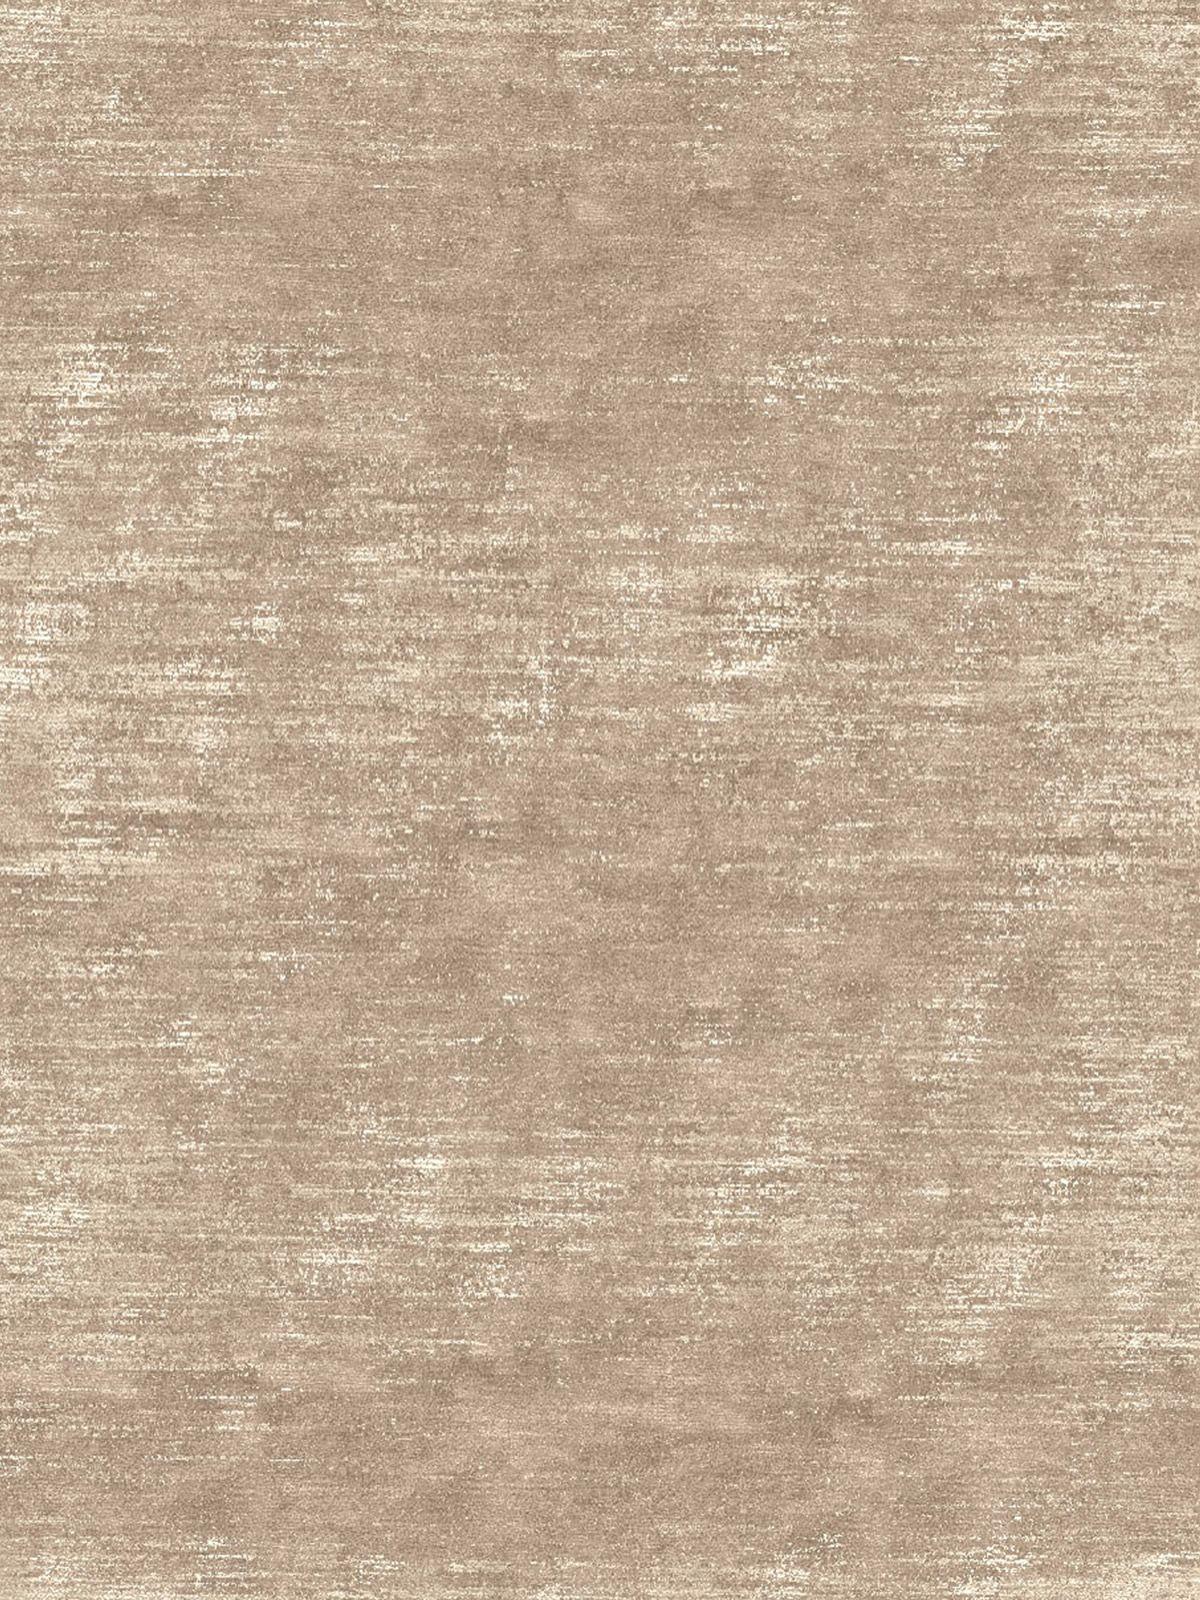 Beige carpet texture Minimalist Dune Sand Rug Bazaar Velvet London Rugs Pinterest Dune Sand Rug In 2019 Contemporary Luxury Interior Design Rugs